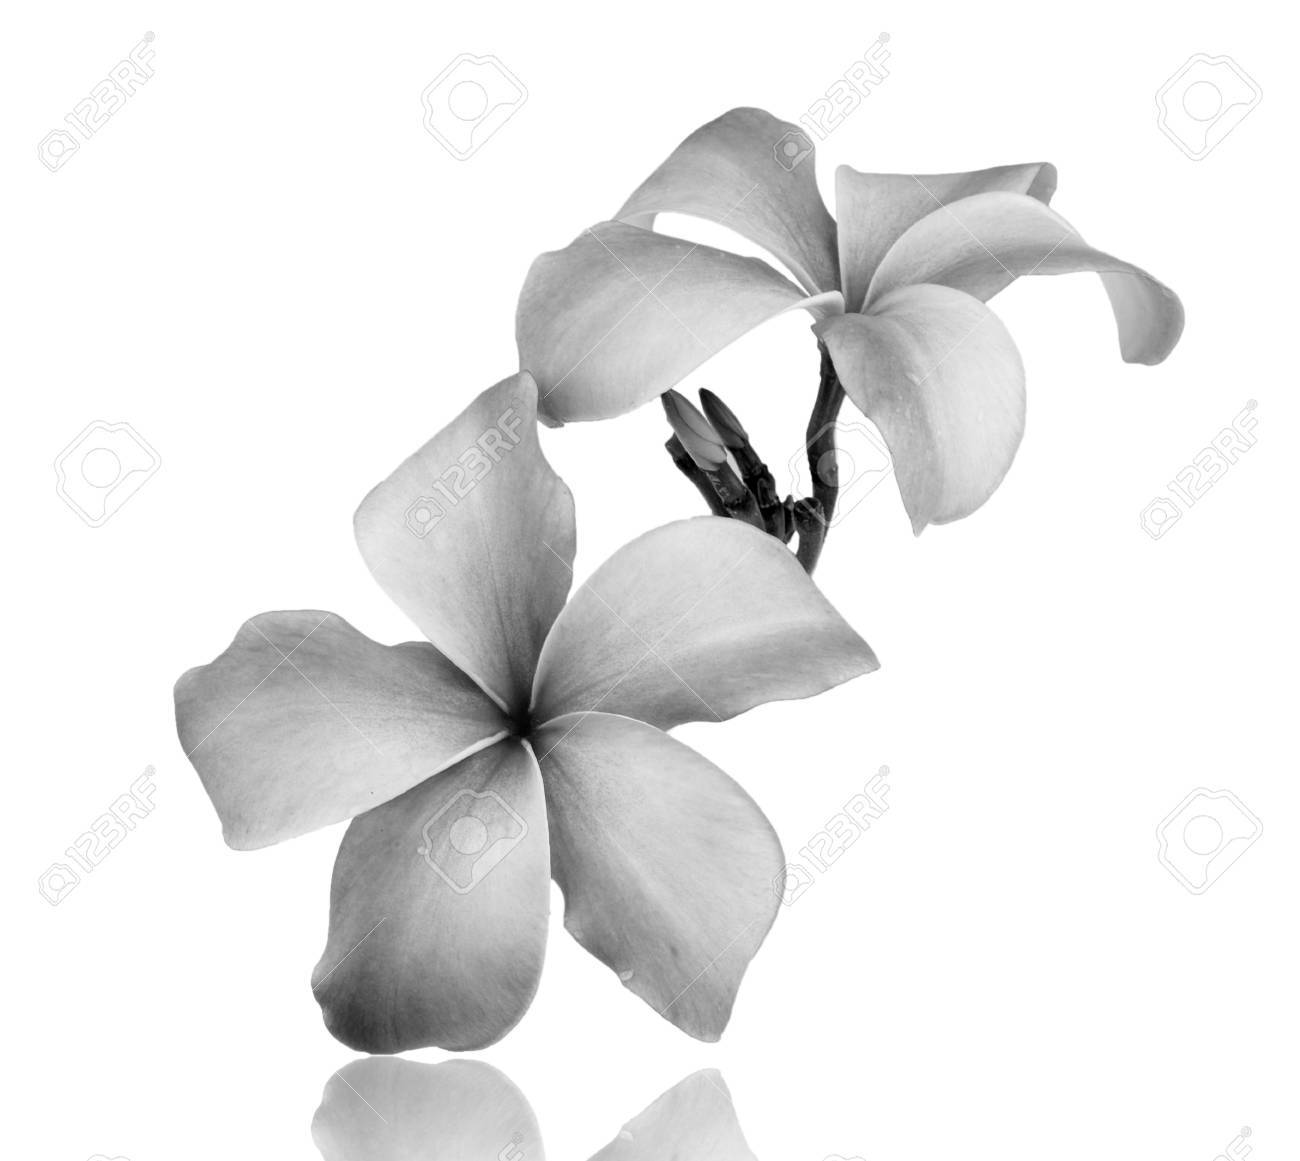 Frangipani flower black and white isolated on white background frangipani flower black and white isolated on white background stok fotoraf 30497834 mightylinksfo